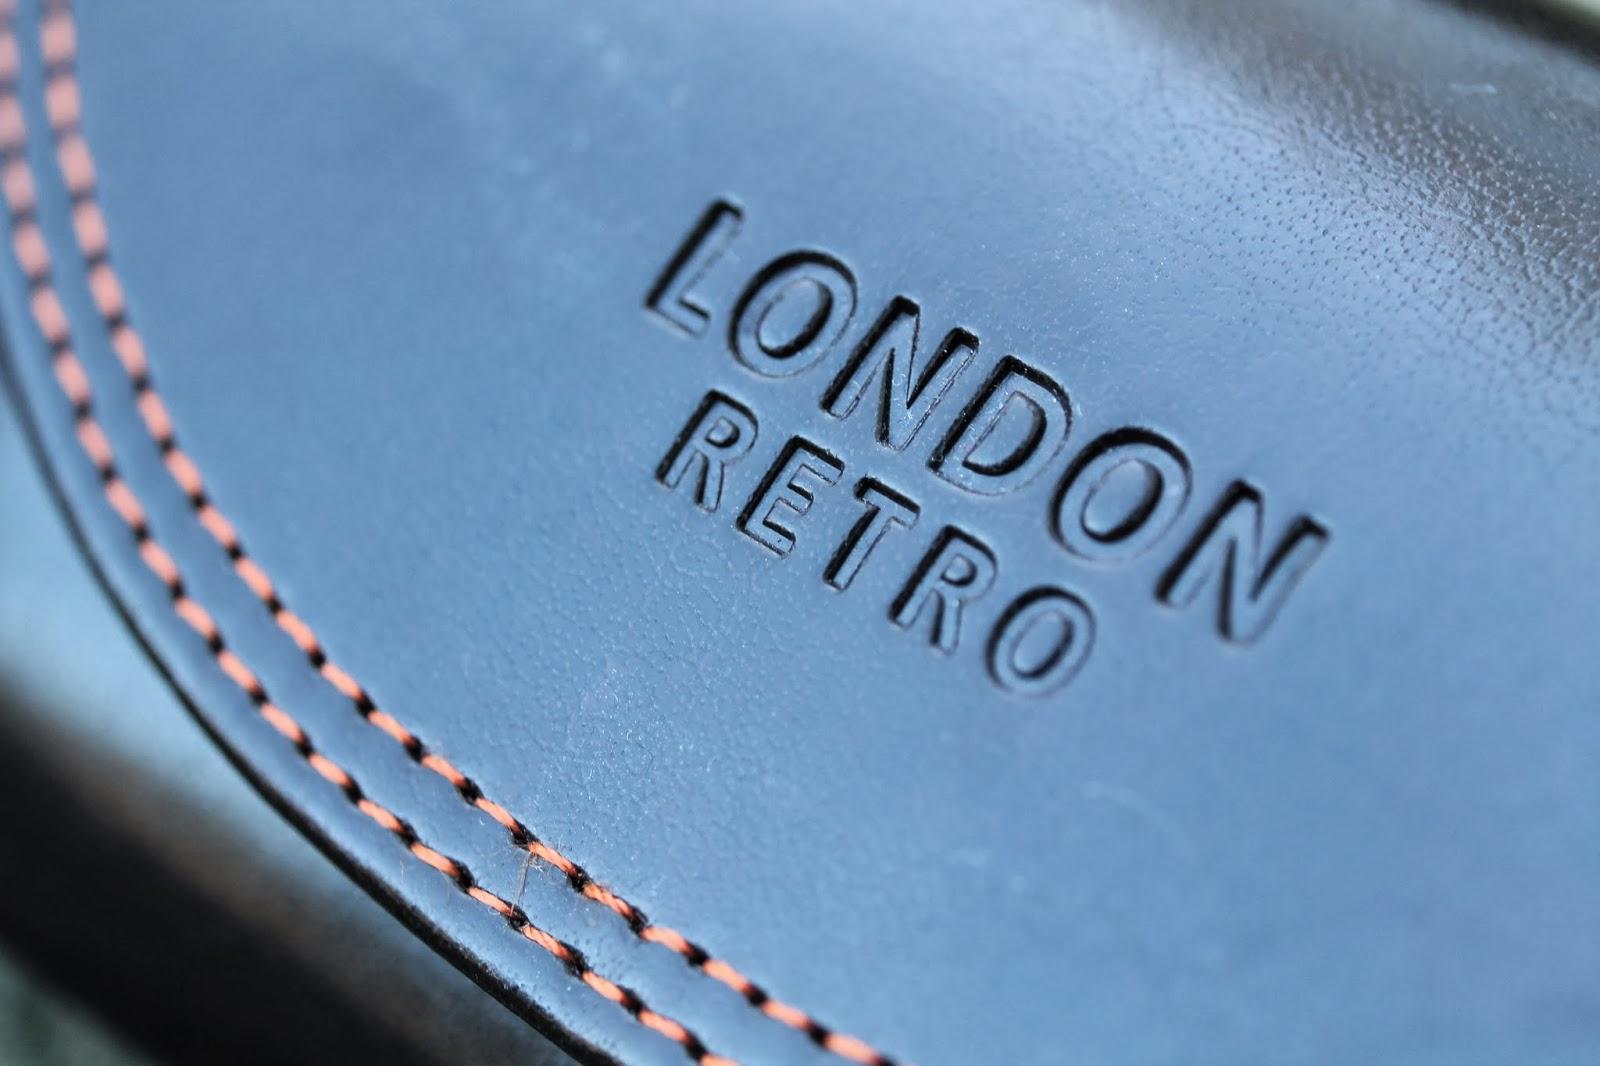 London Retro Soho Glasses review